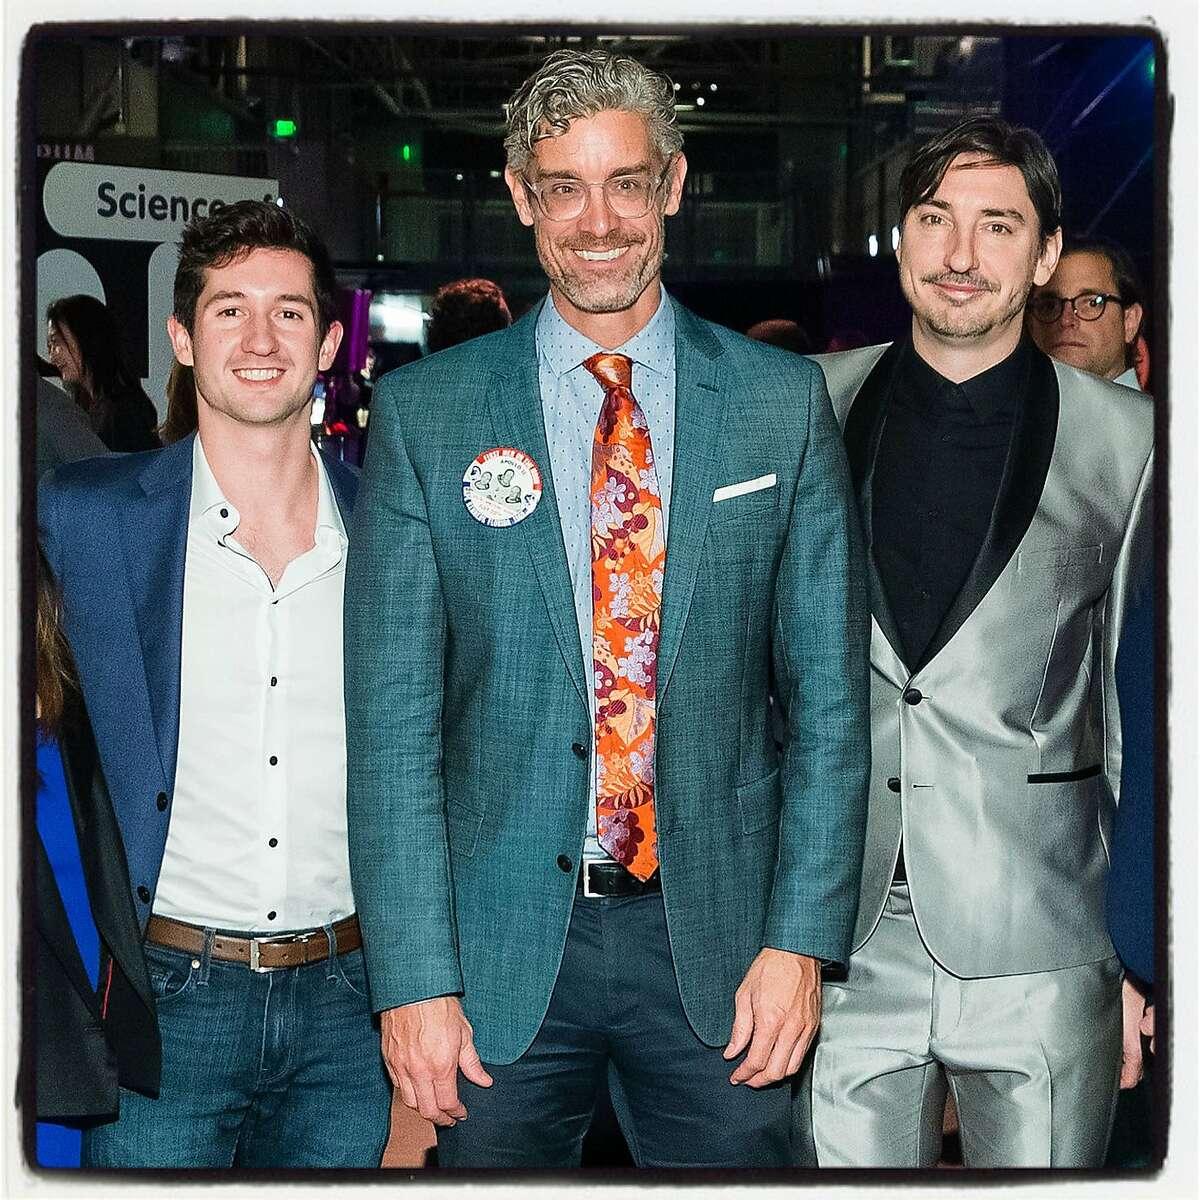 Zach Cogan (left) with Exploratorium Director Chris Flink and Doug Dalton at the Science of Cocktails fundraiser. Feb. 8, 2019